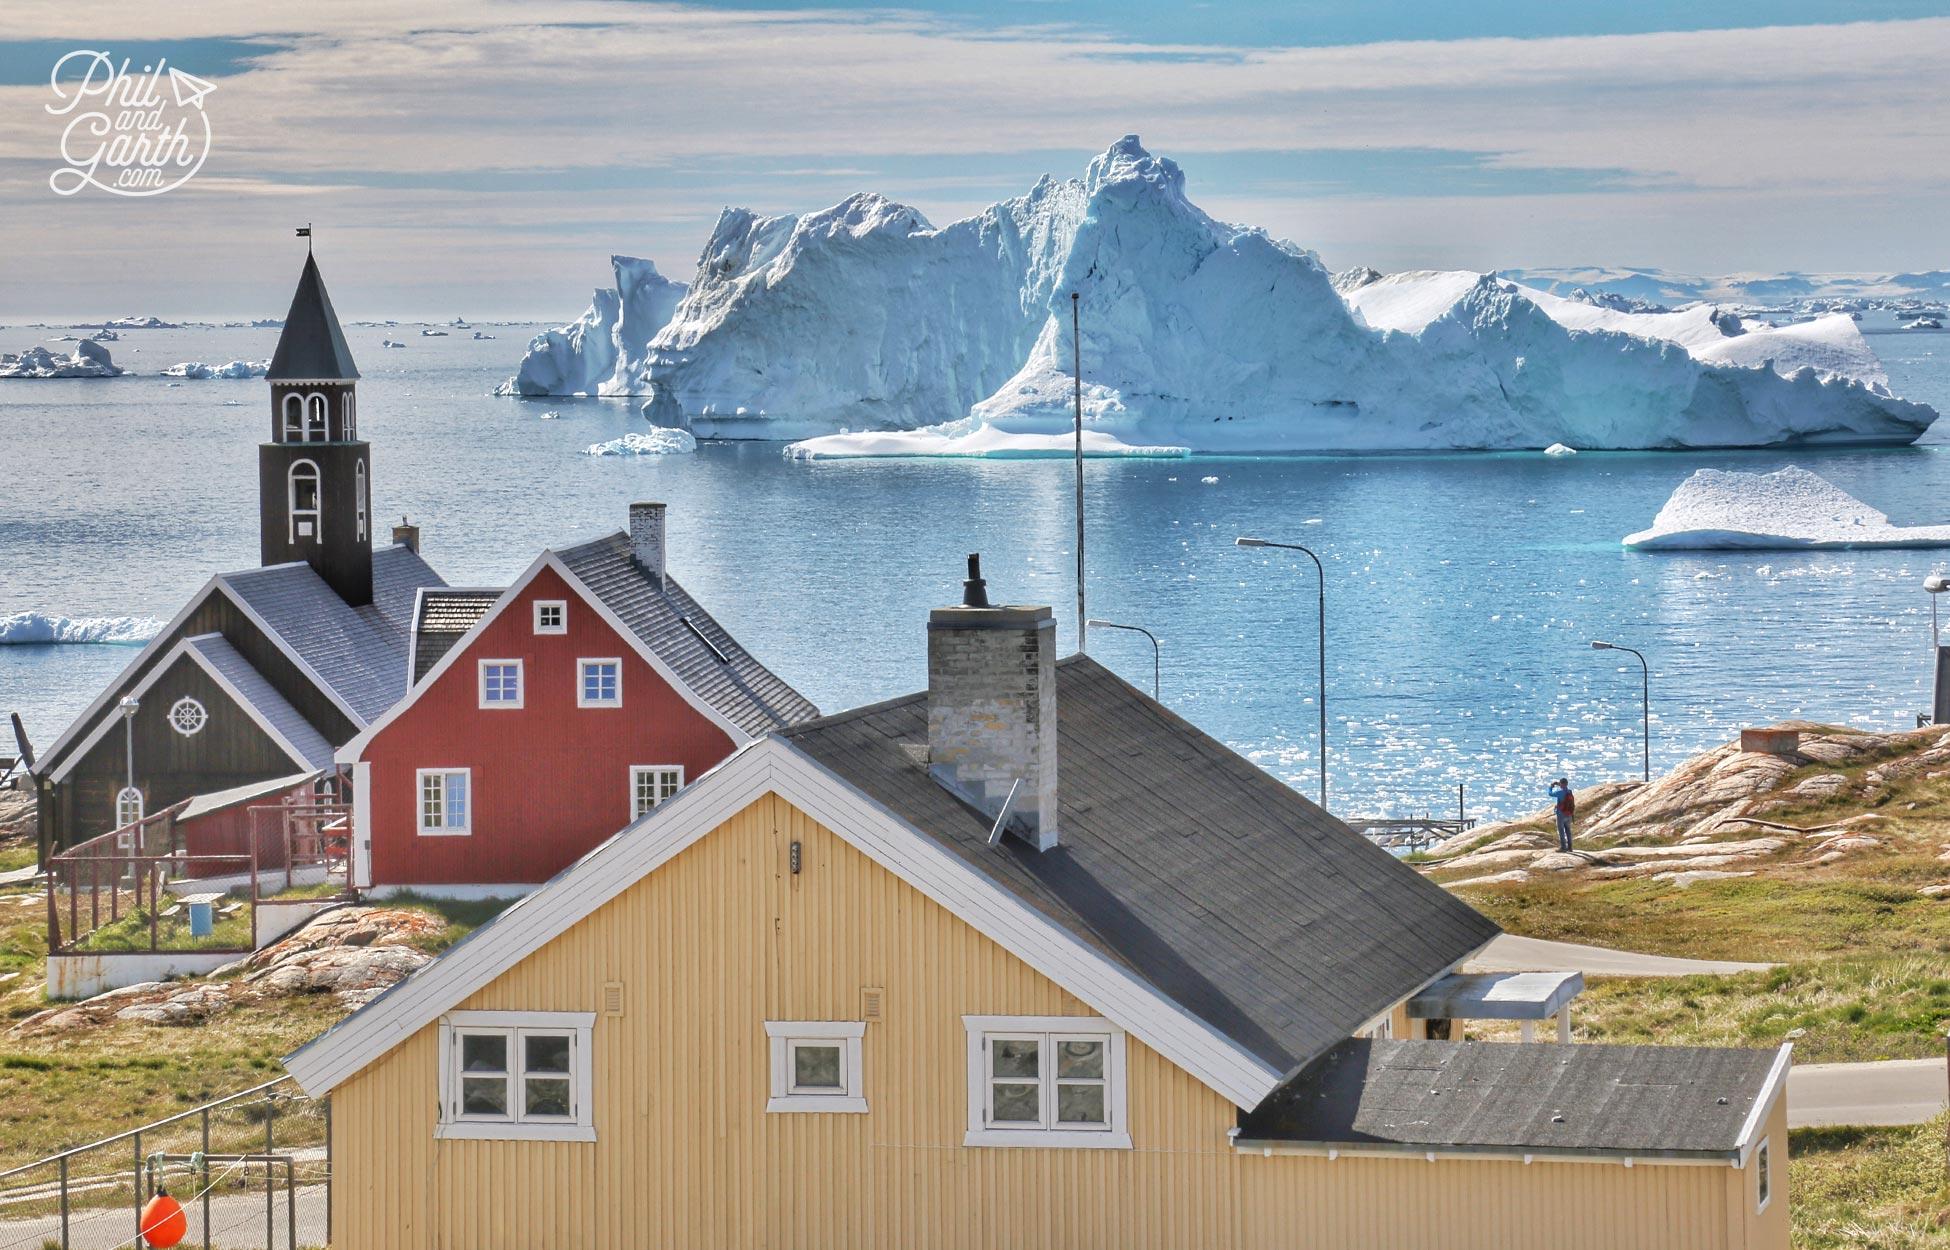 Ilulissat is a rainbow coloured city